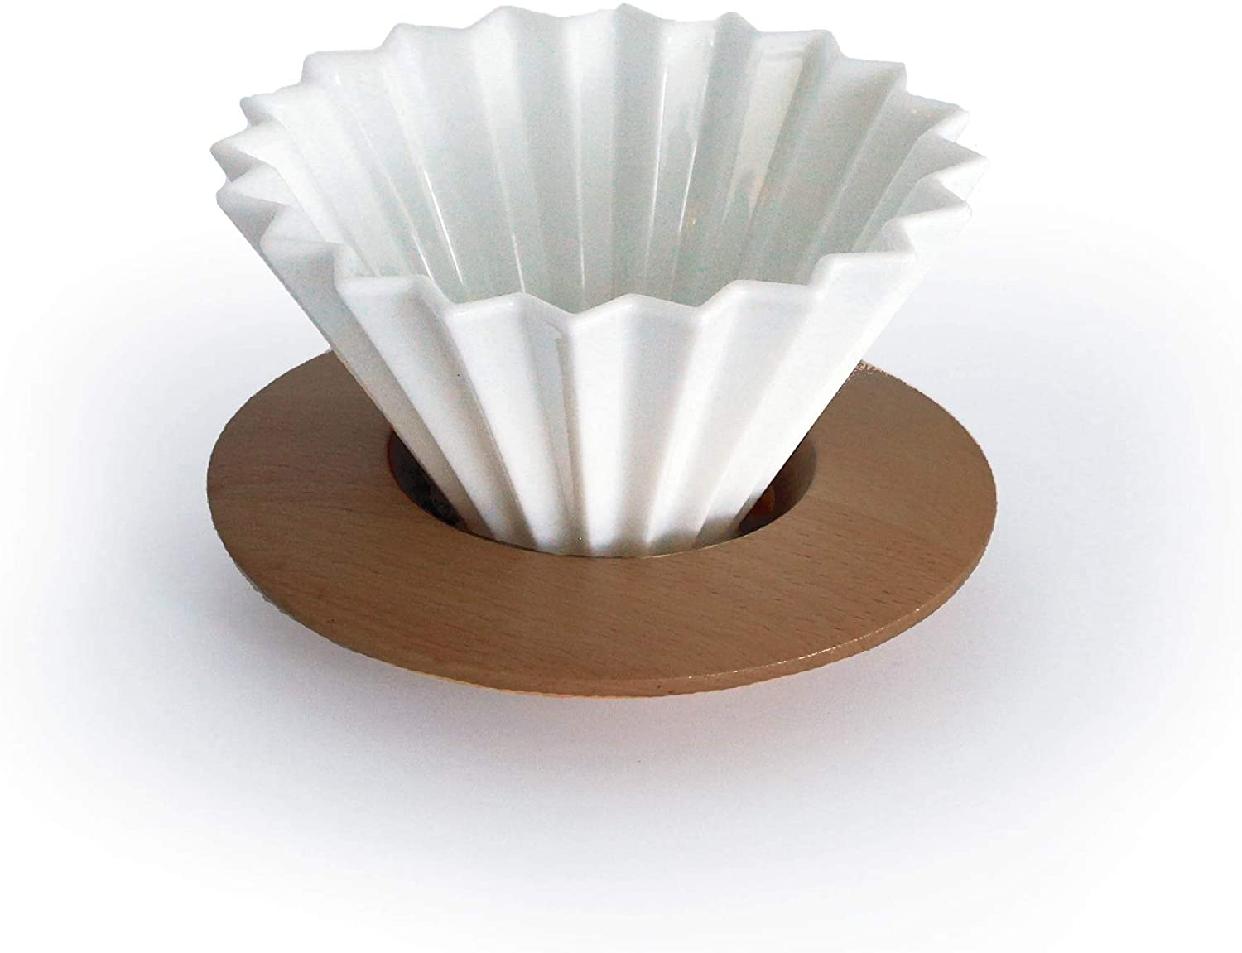 ORIGAMI(オリガミ) ドリッパーSの商品画像